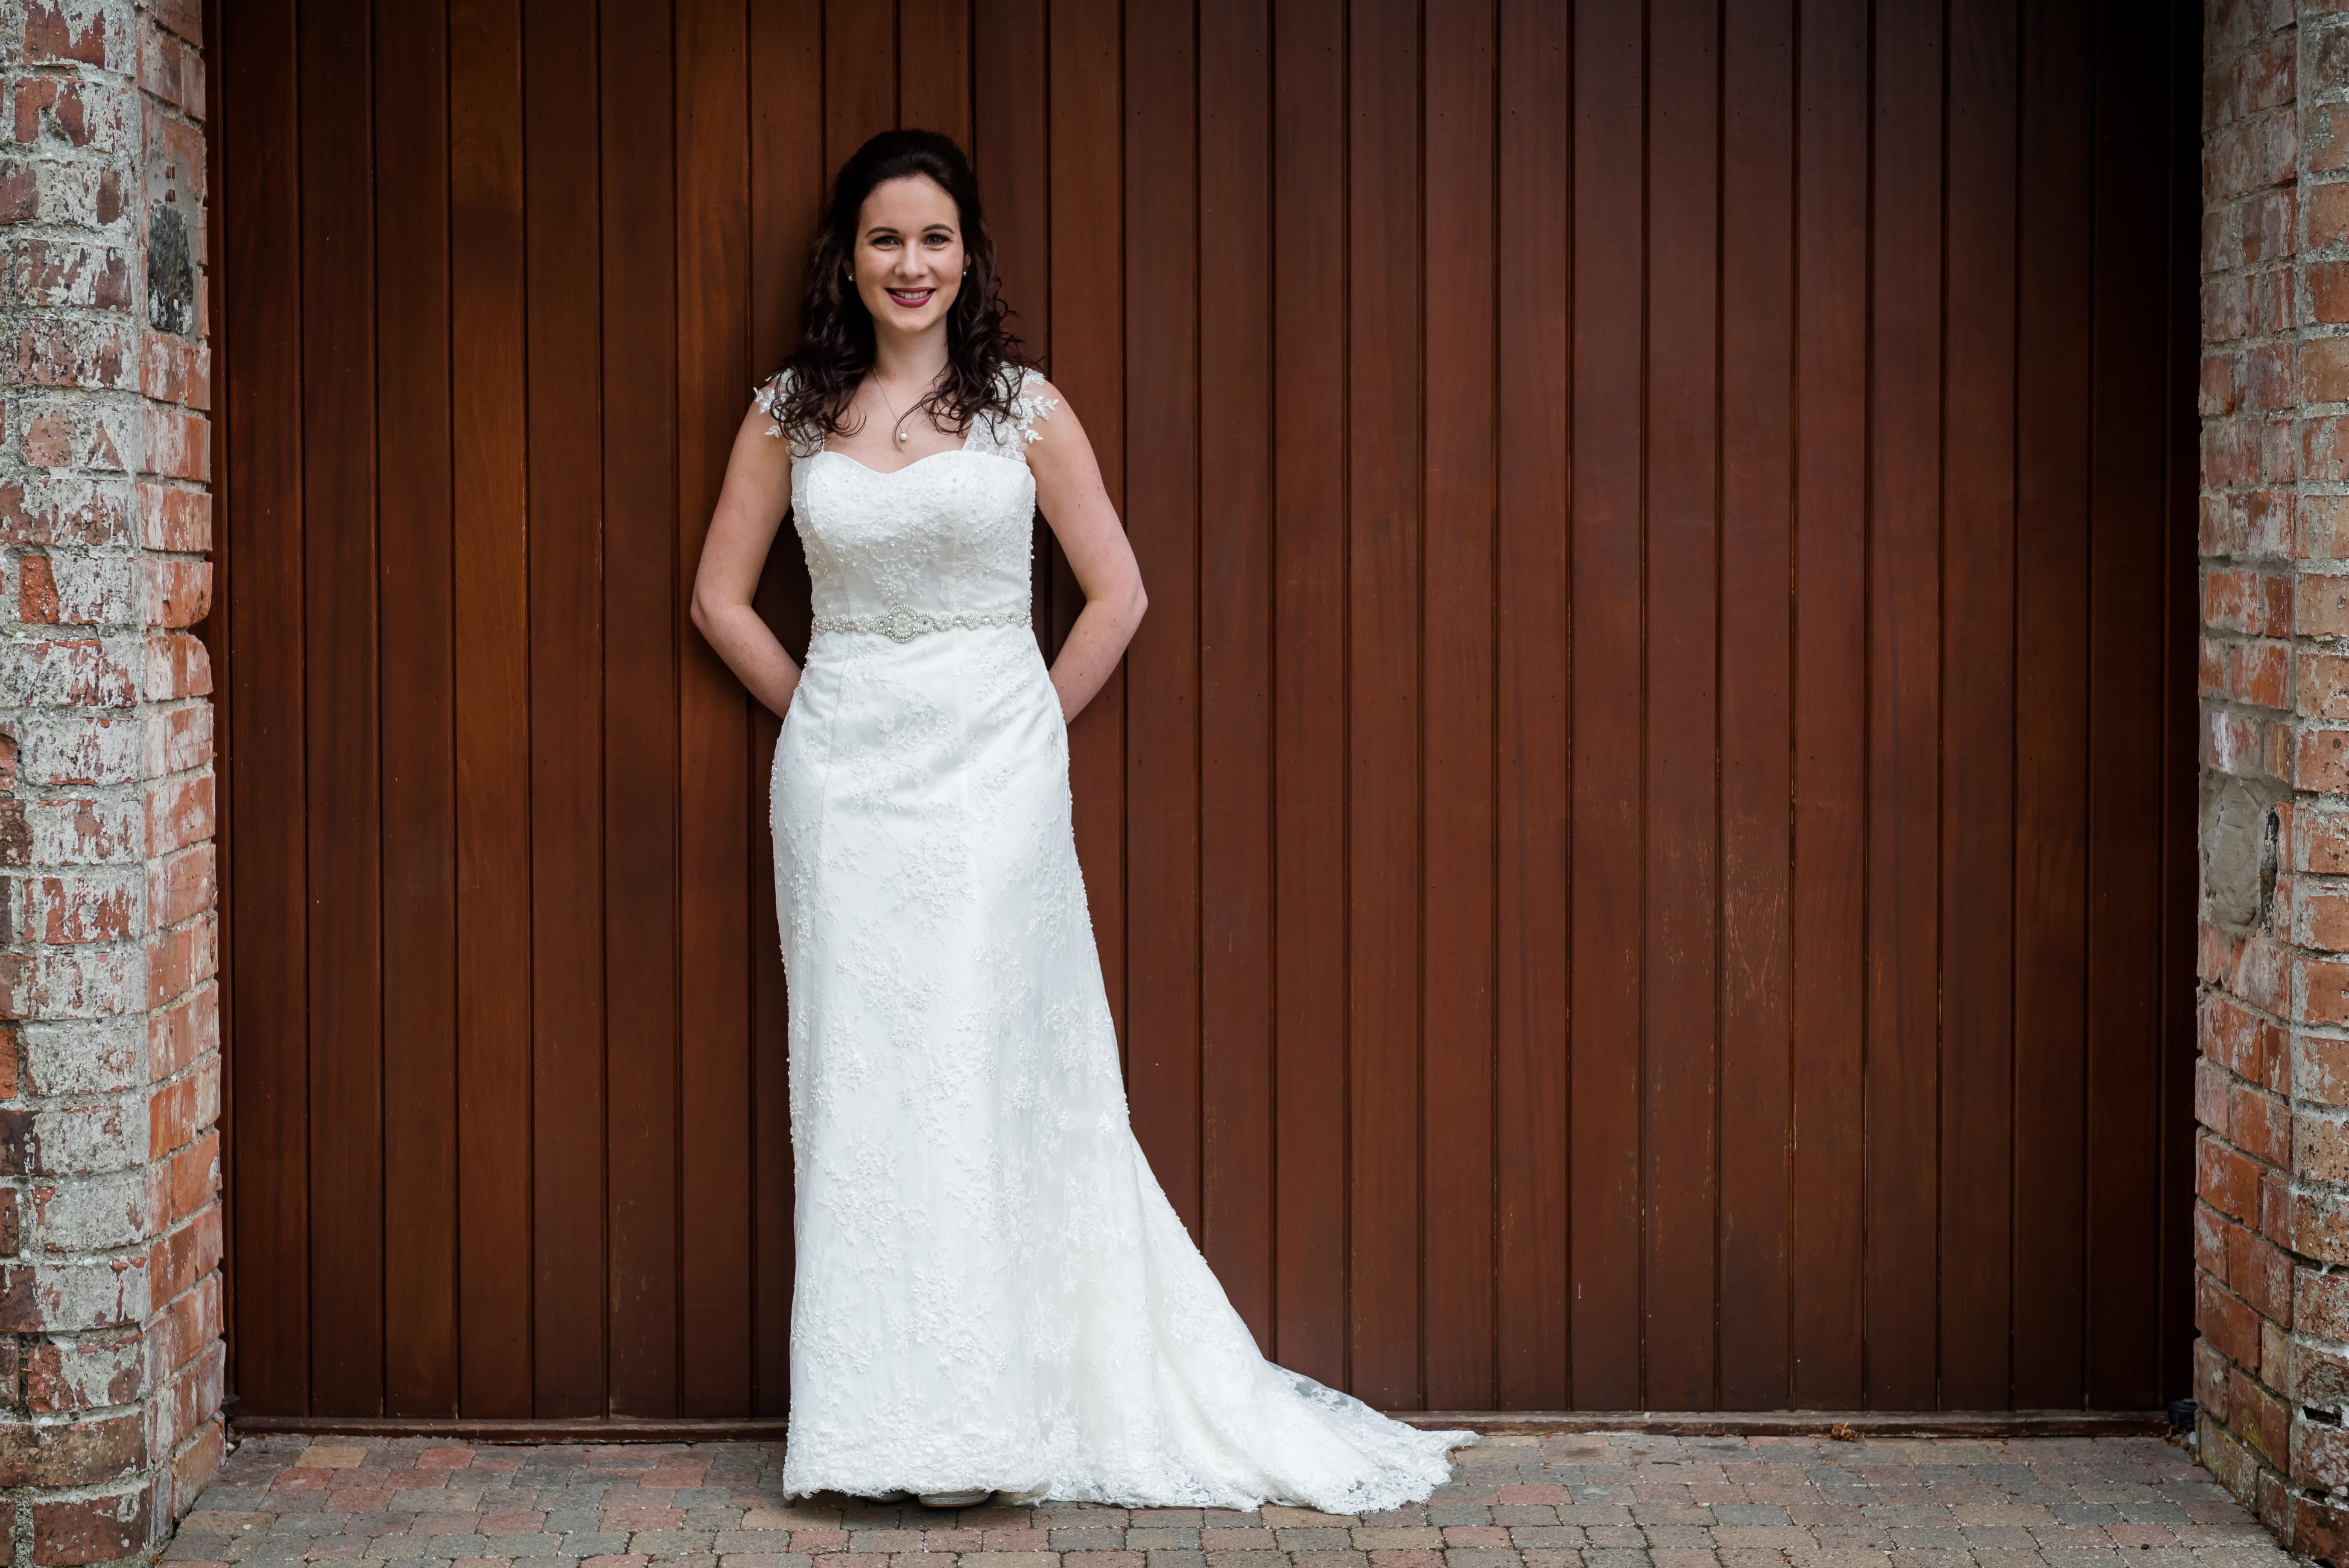 Joanne Ferguson Bridal Designer | Wedding Dress and Accessories ...